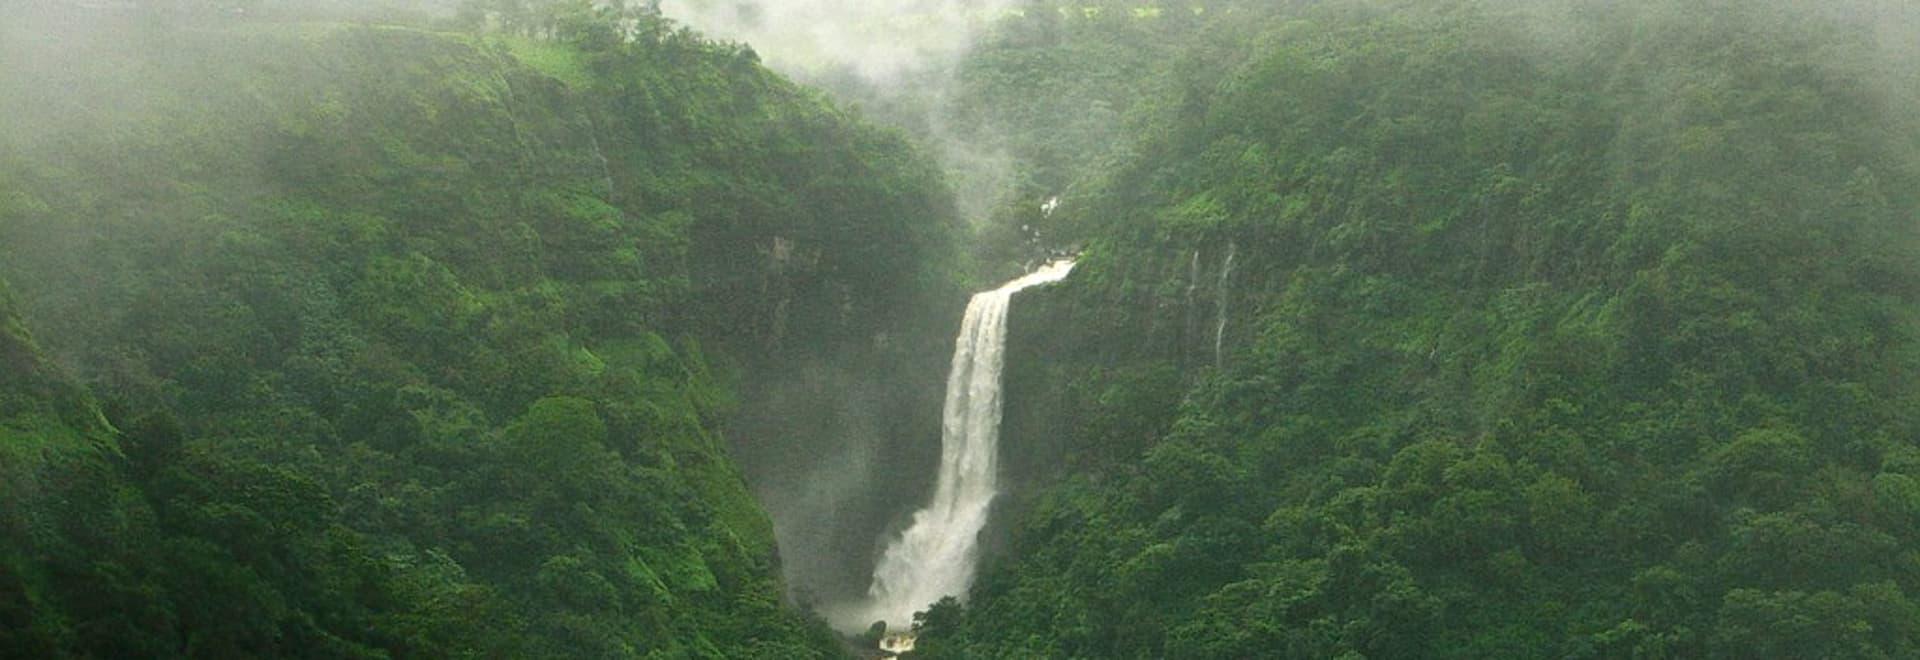 Khandala.jpg